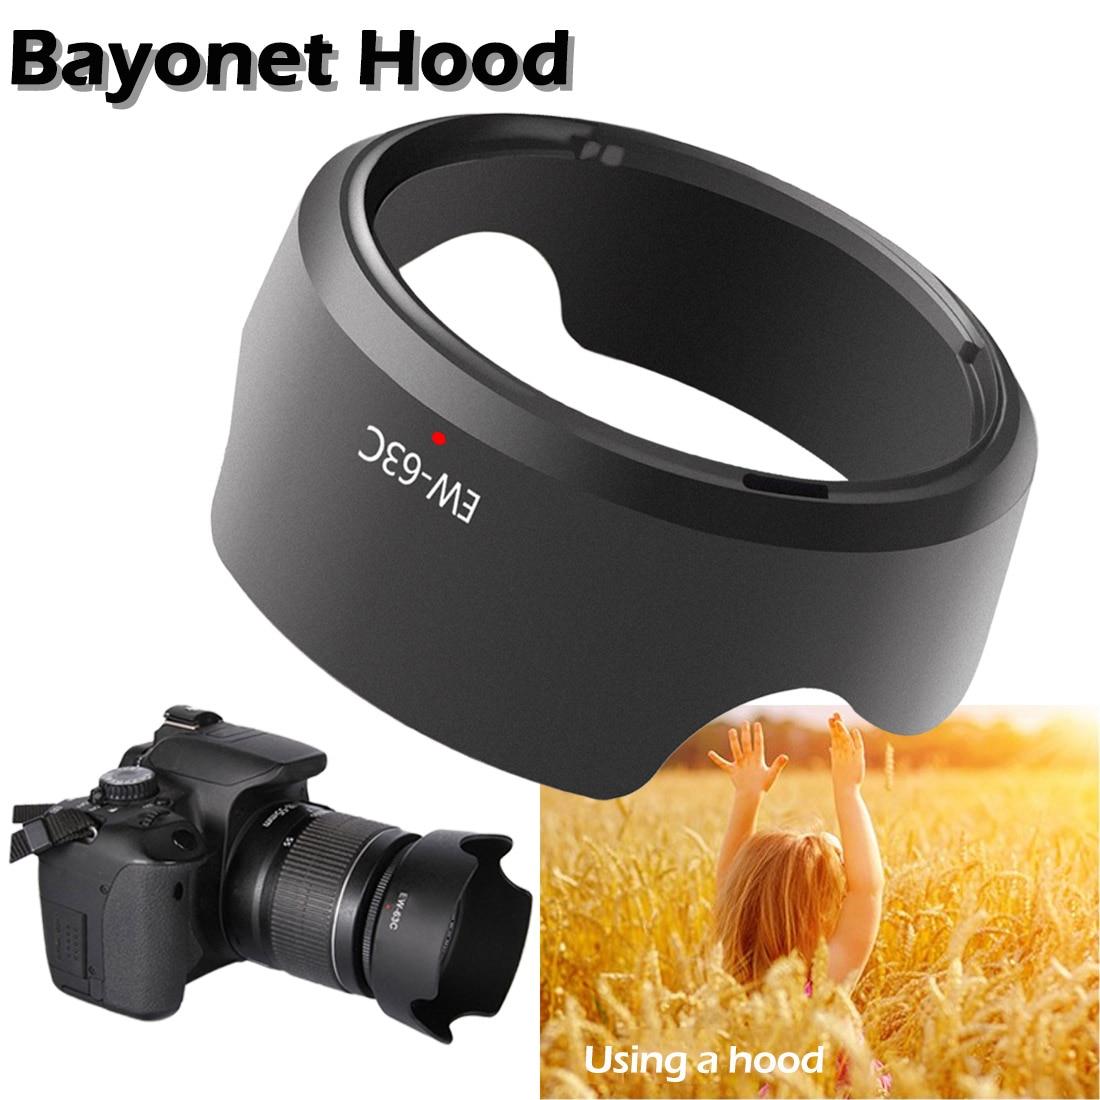 Universal EW-63C Camera Lens Hood For Canon EF-S 18-55mm F/3.5-5.6 IS 58mm Screw-in Tulip Flower Filter Thread Camera Lens Hood